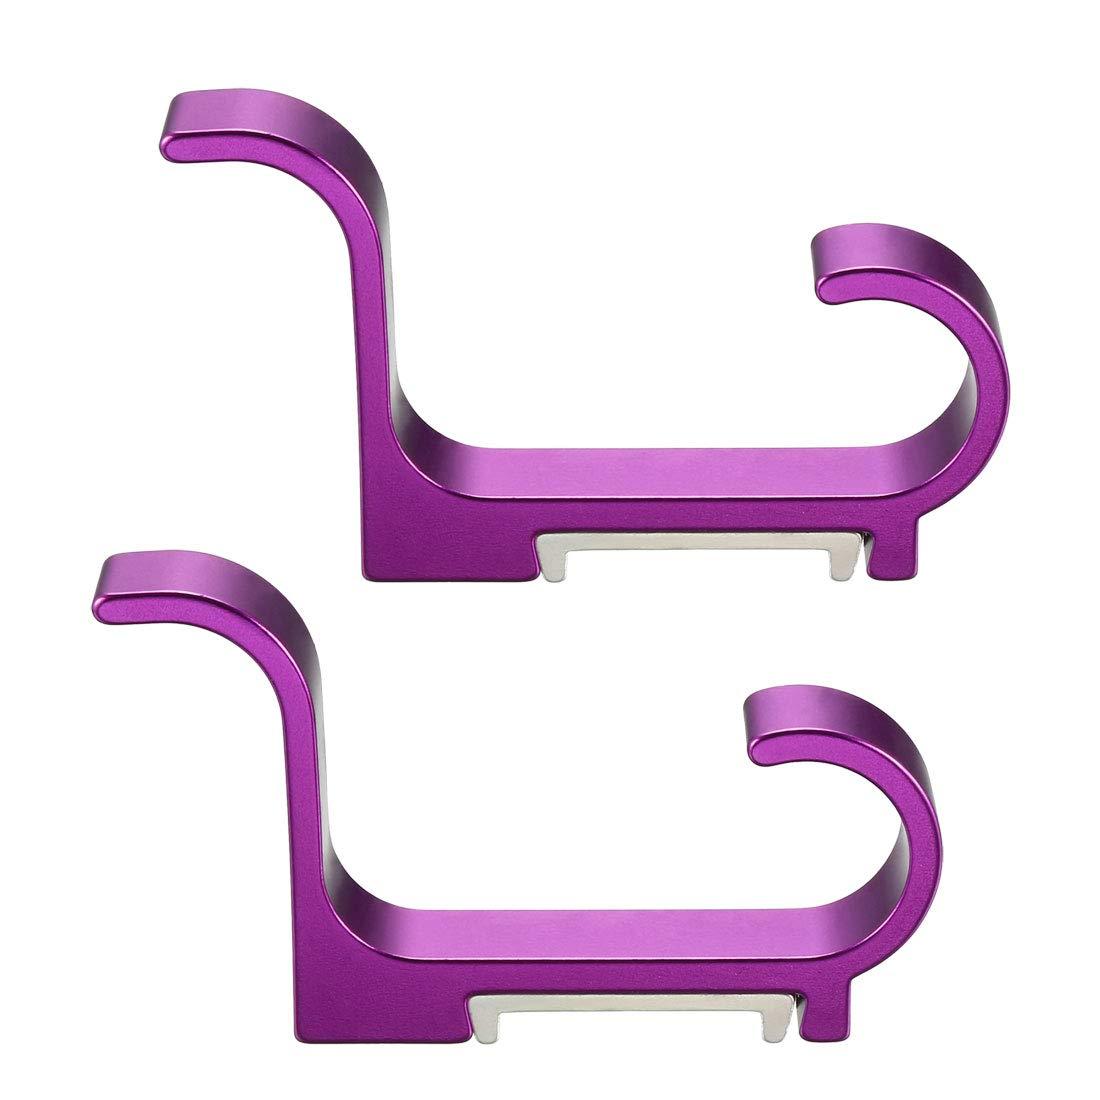 Juego de 2 ganchos para colgar toallas con tornillos color morado Sourcingmap aleaci/ón de aluminio